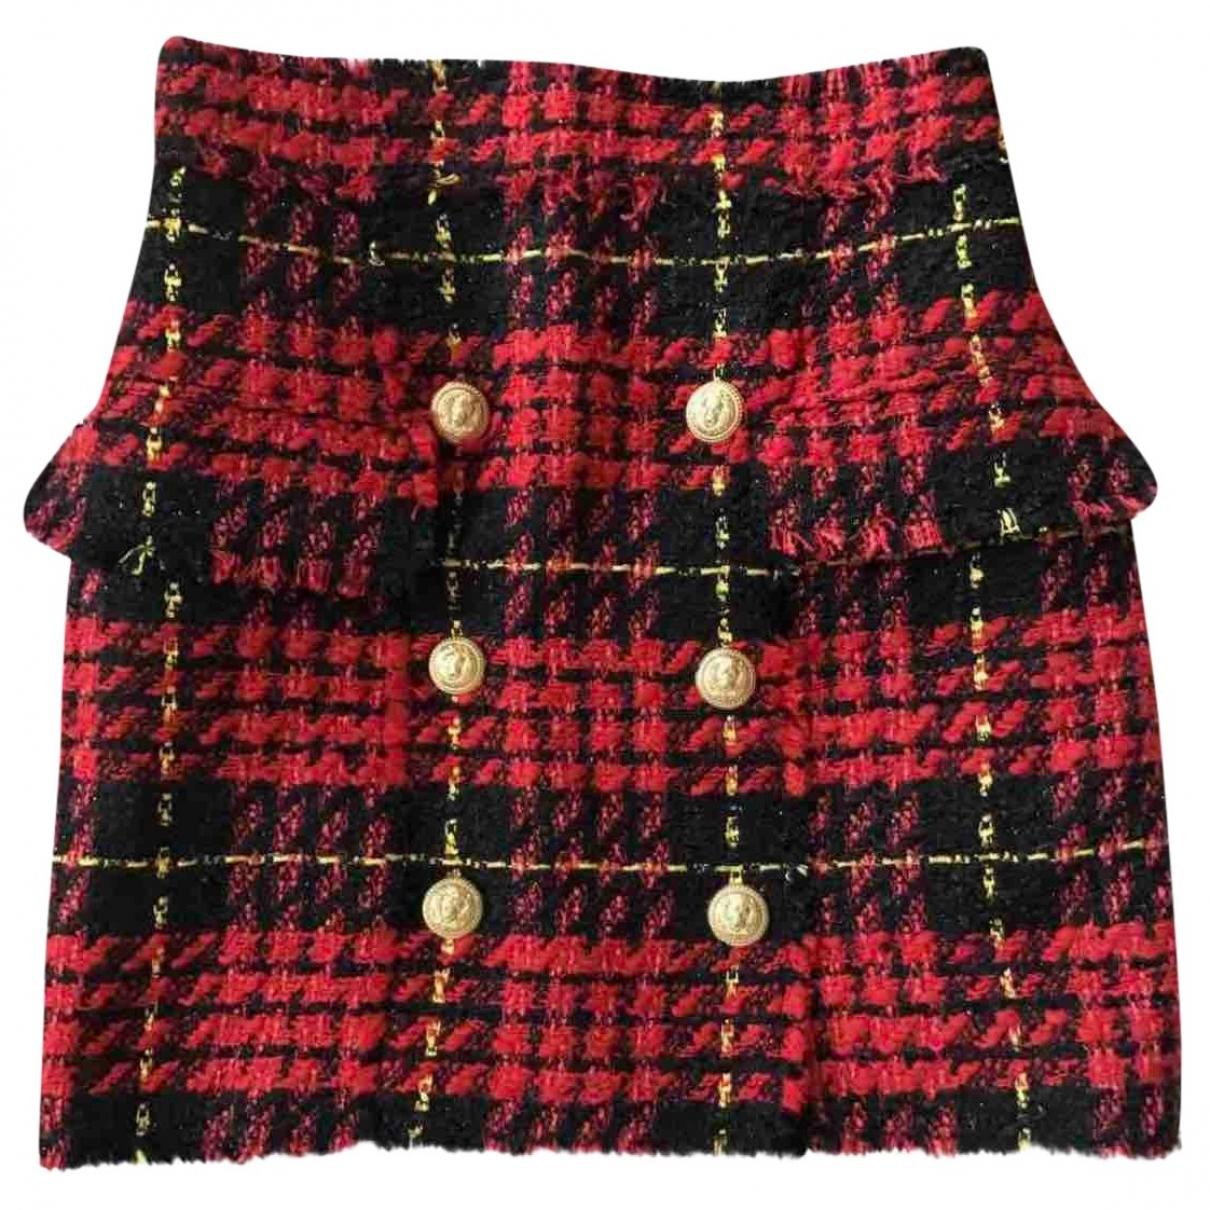 Balmain \N Red Tweed skirt for Women 40 FR